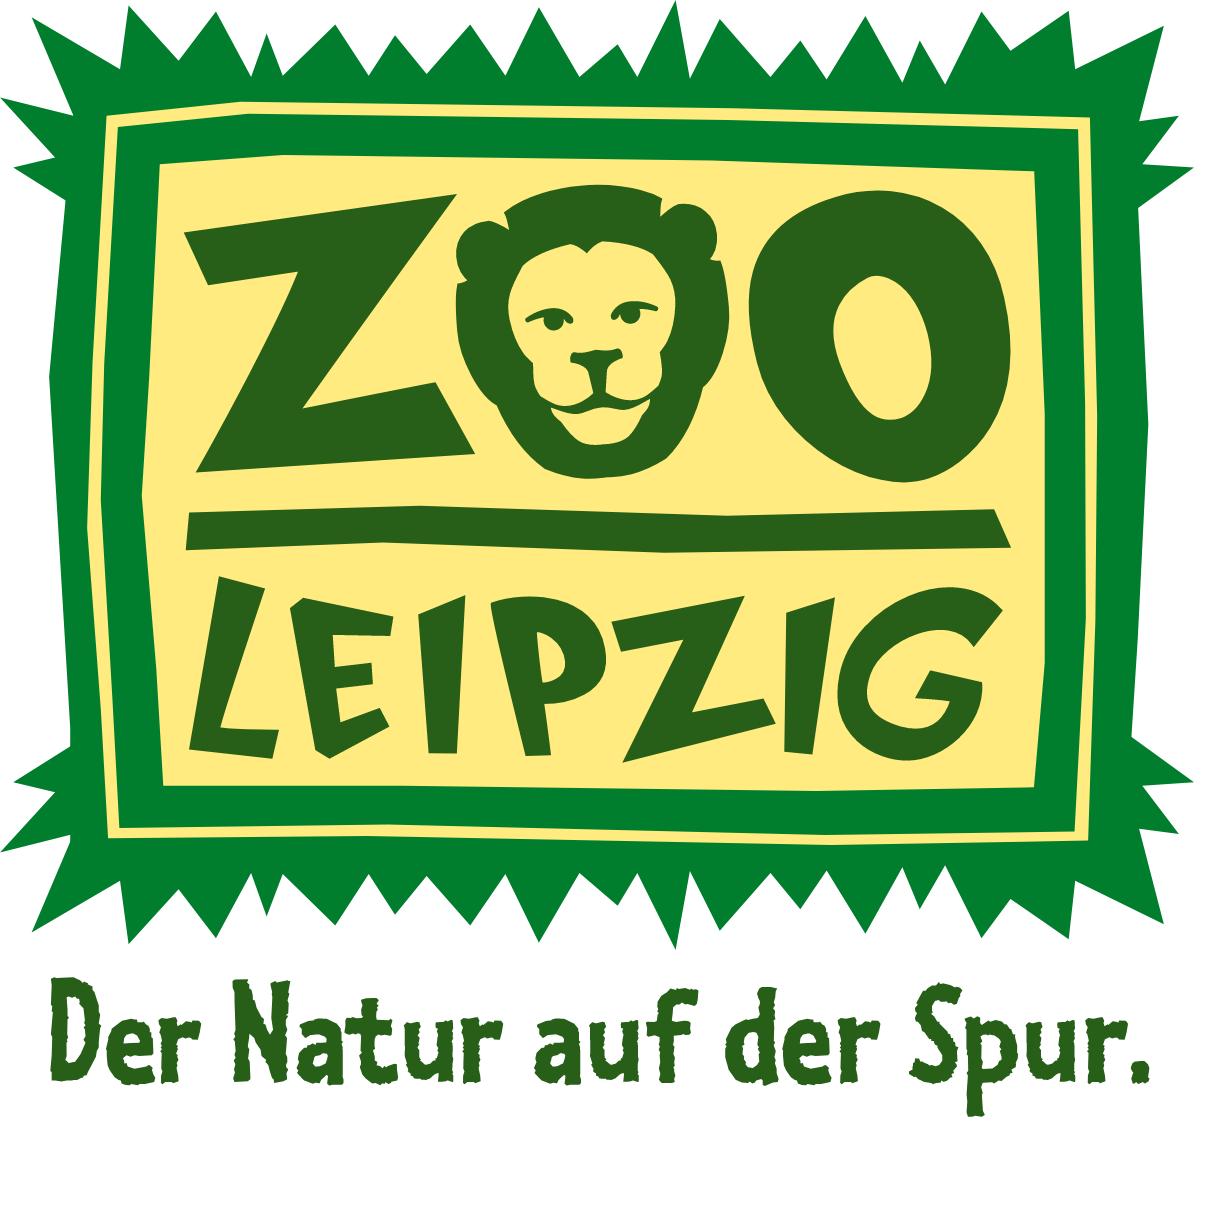 bunch_sound_Berlin_Funkspot_Funkspotproduktion_Zoo_Leipzig_Logo